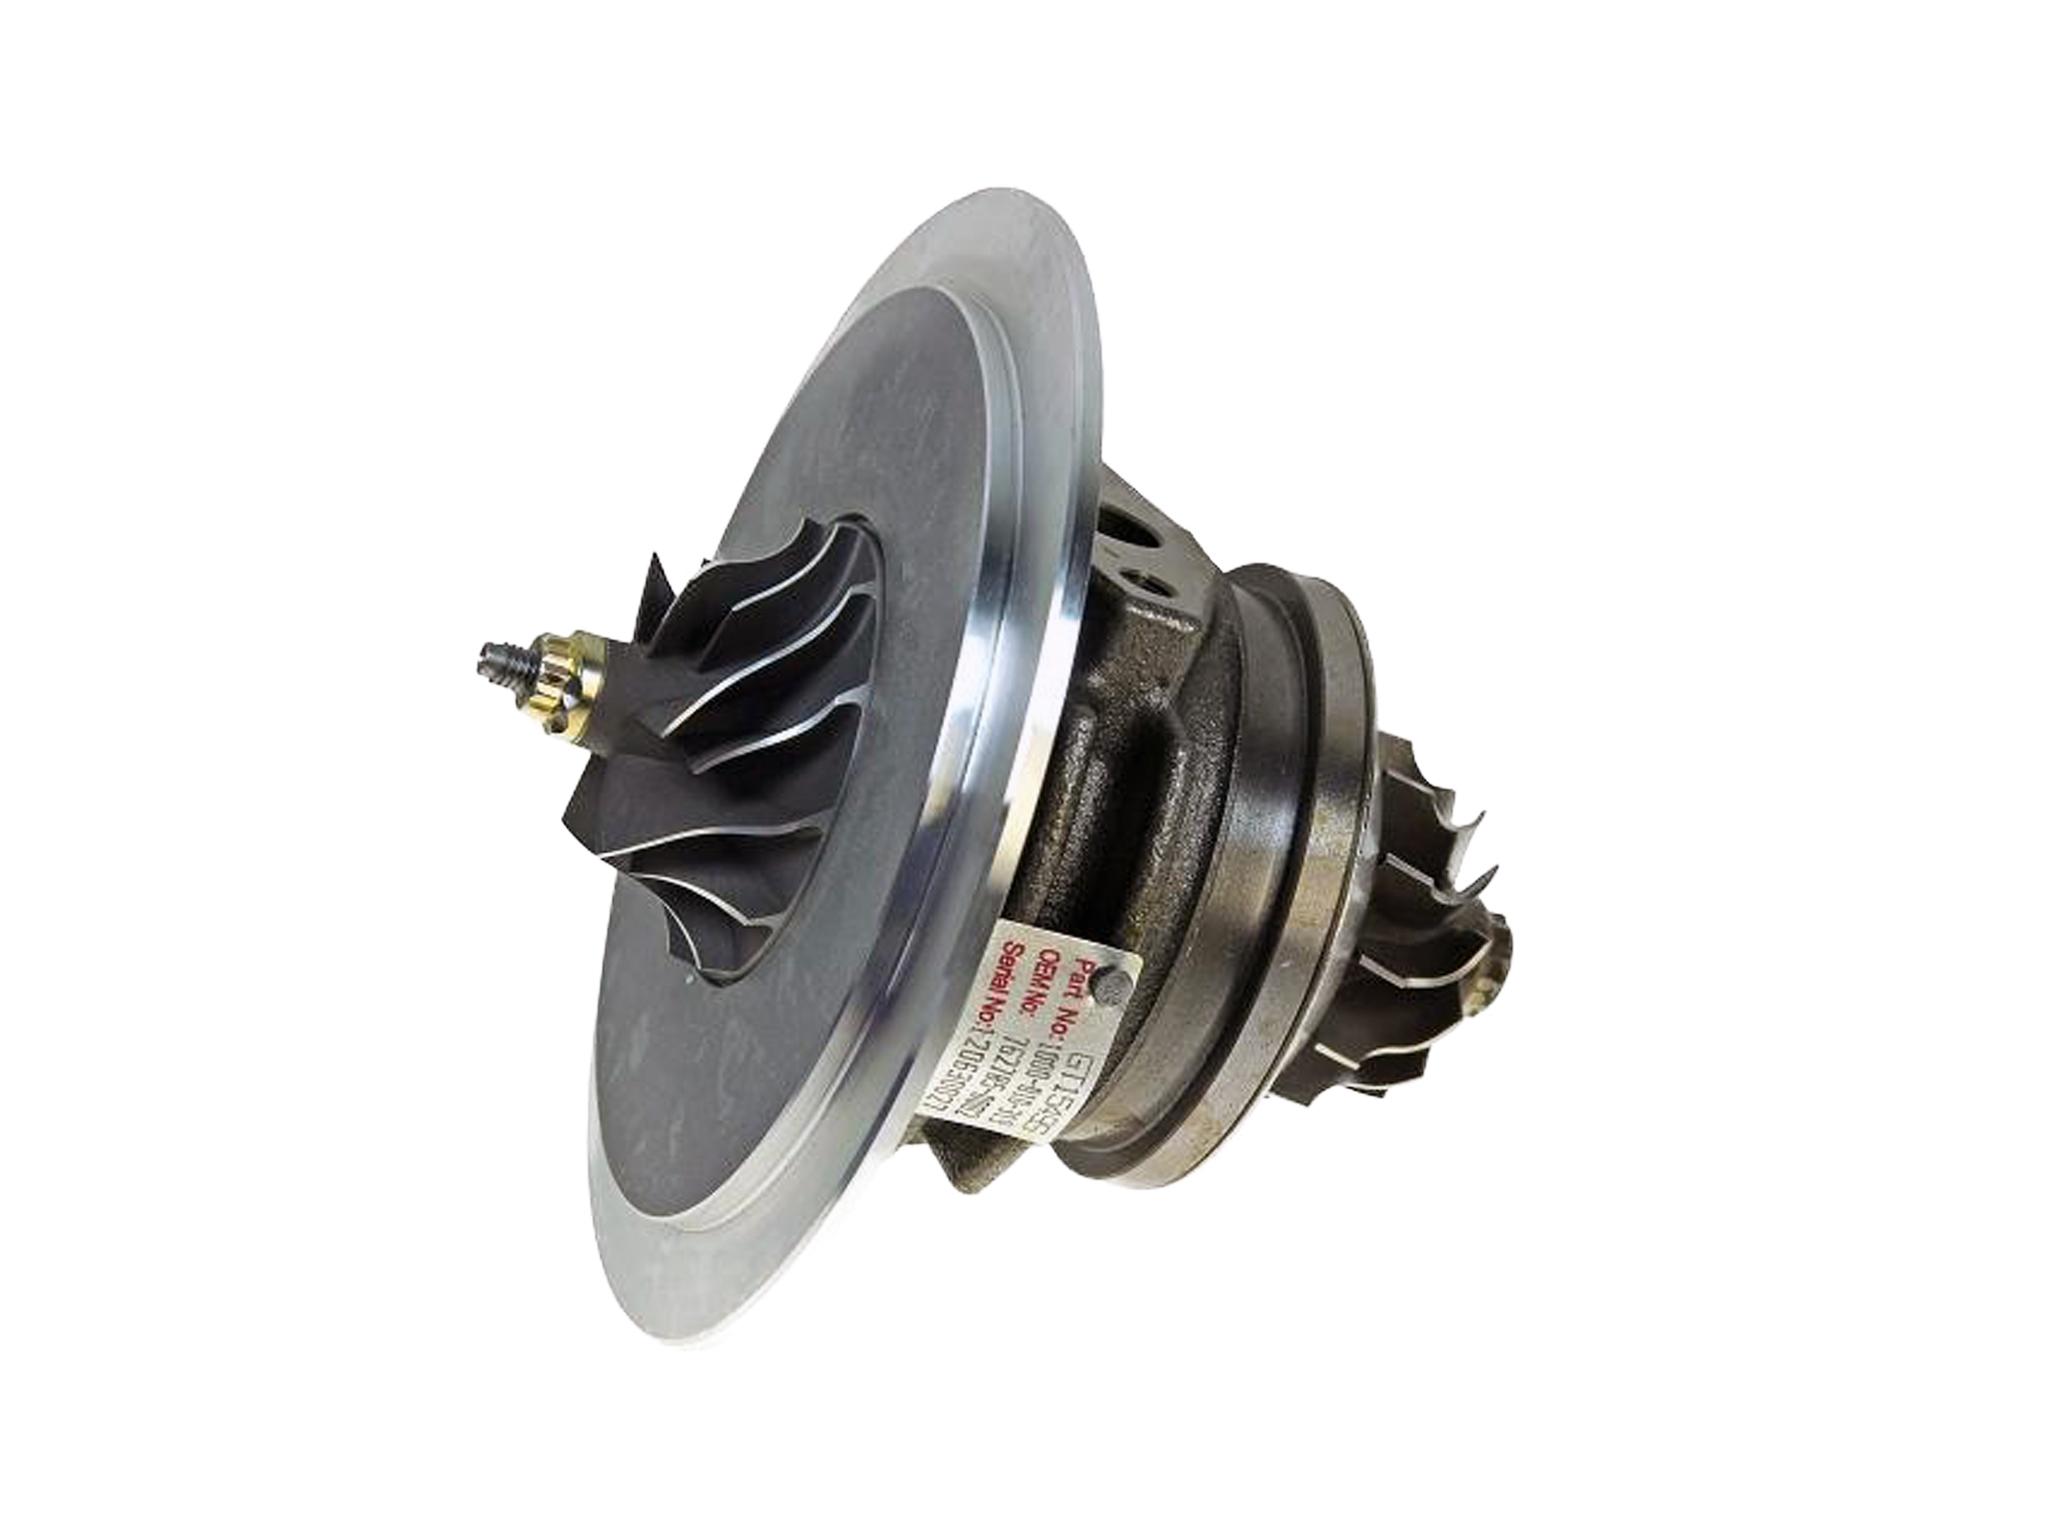 Картридж турбины GT1549S Рено Трафик 2.0 CDTI 90 / 114 л.с.